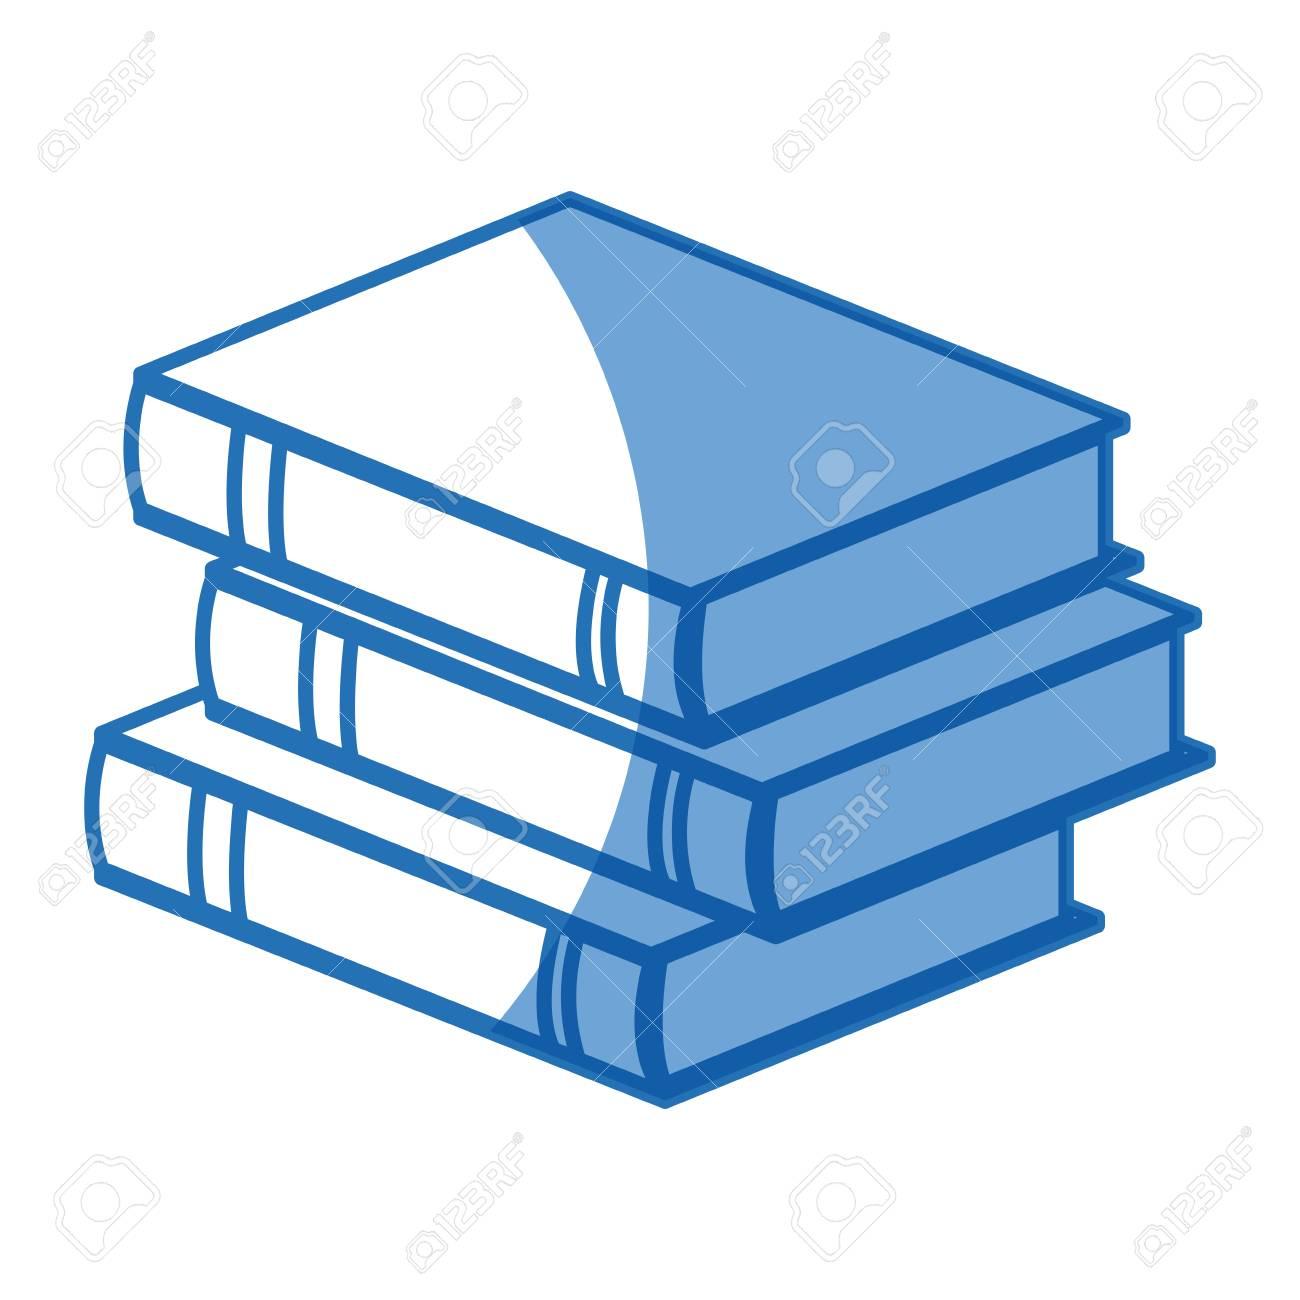 Pile Livre Litterature Apprentissage Etude Vector Illustration